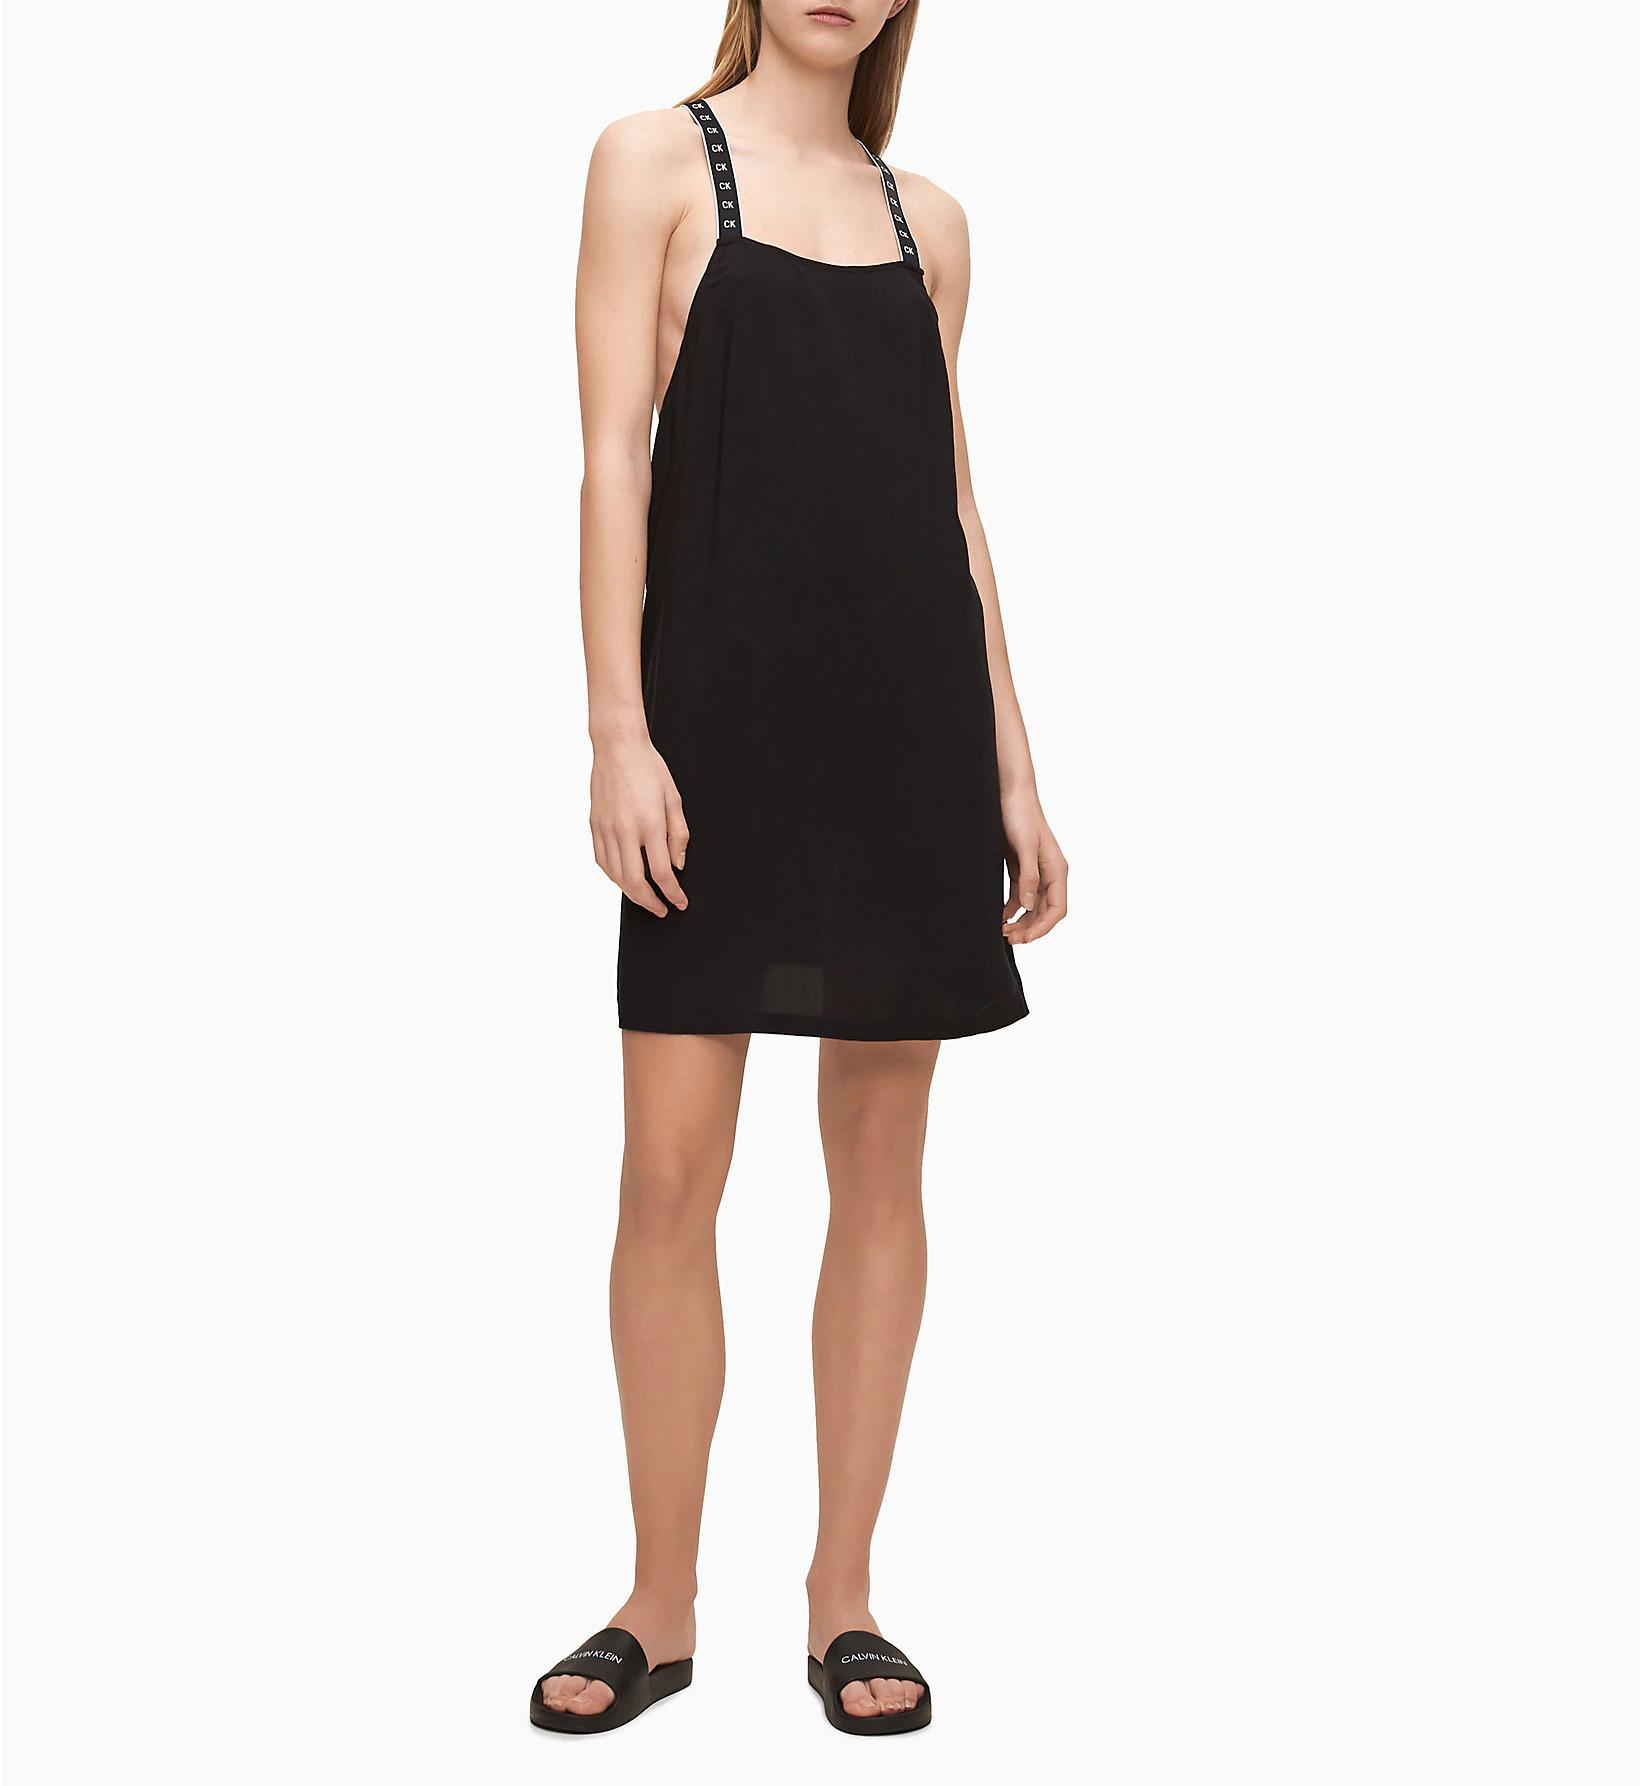 Plážové šaty KW0KW01010-BEH čierna - Calvin Klein čierna L